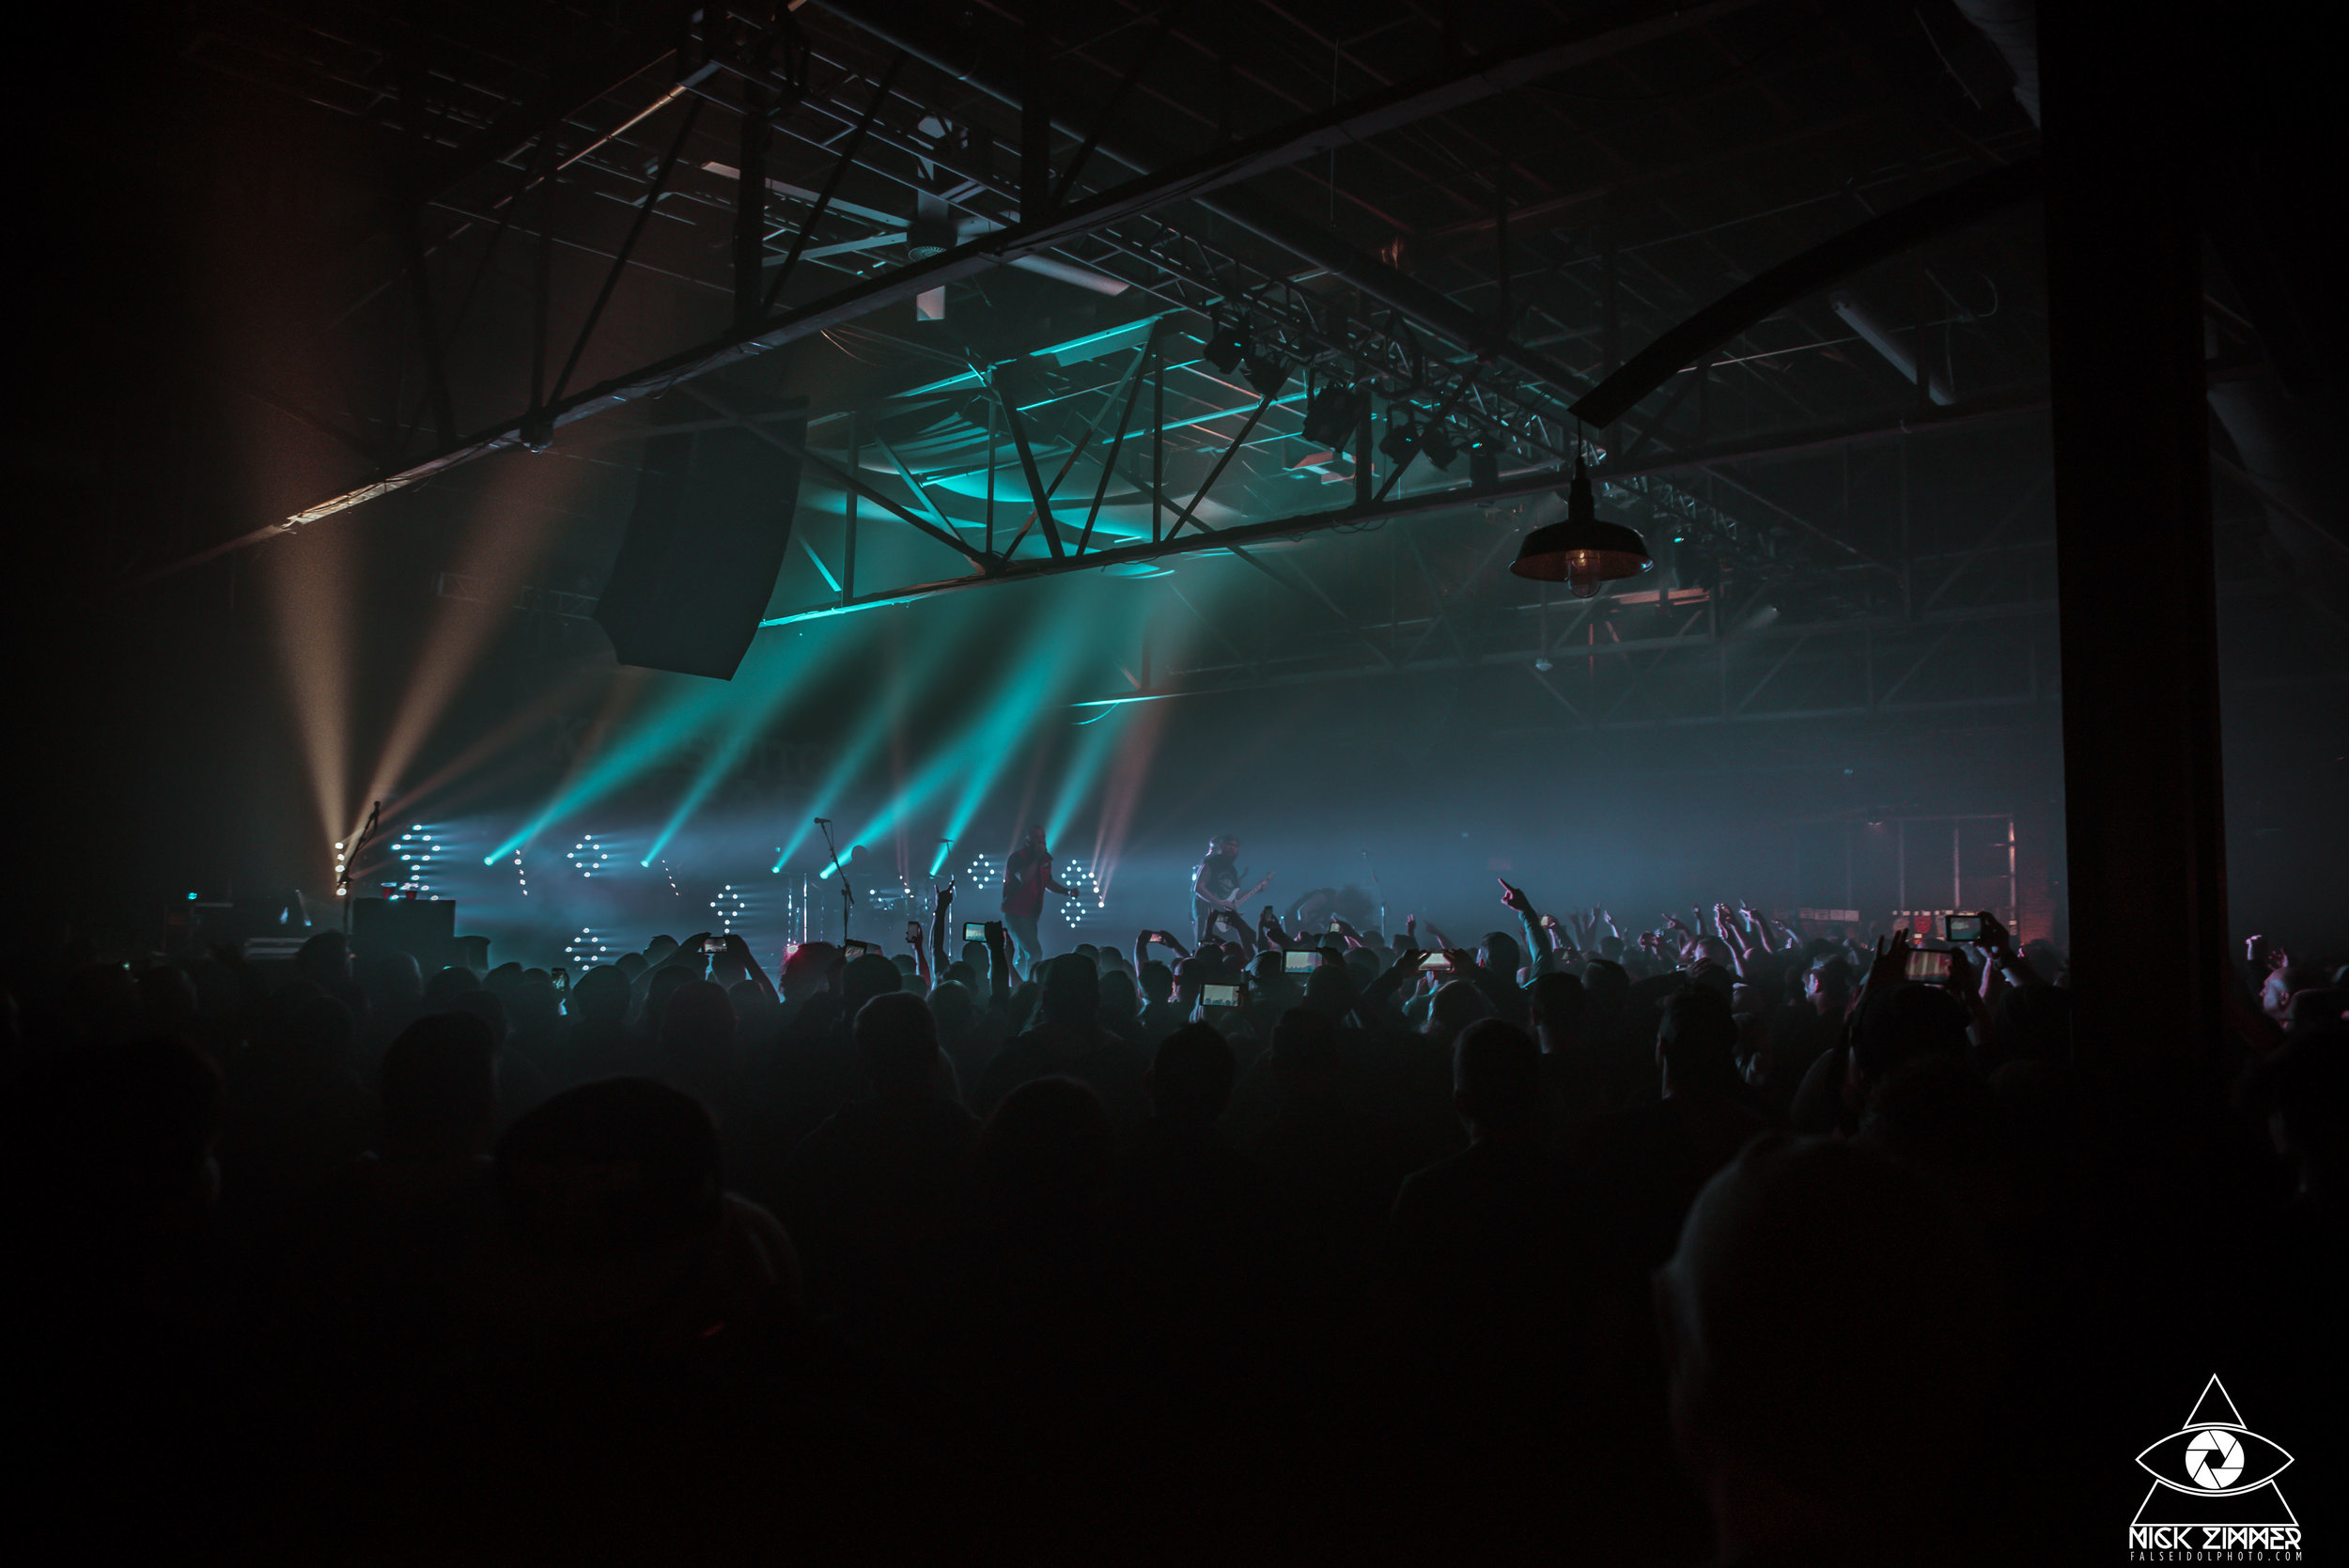 Killthrax II Tour - Venue: Marathon Music WorksCity: Nashville, TNDate: February 5, 2018